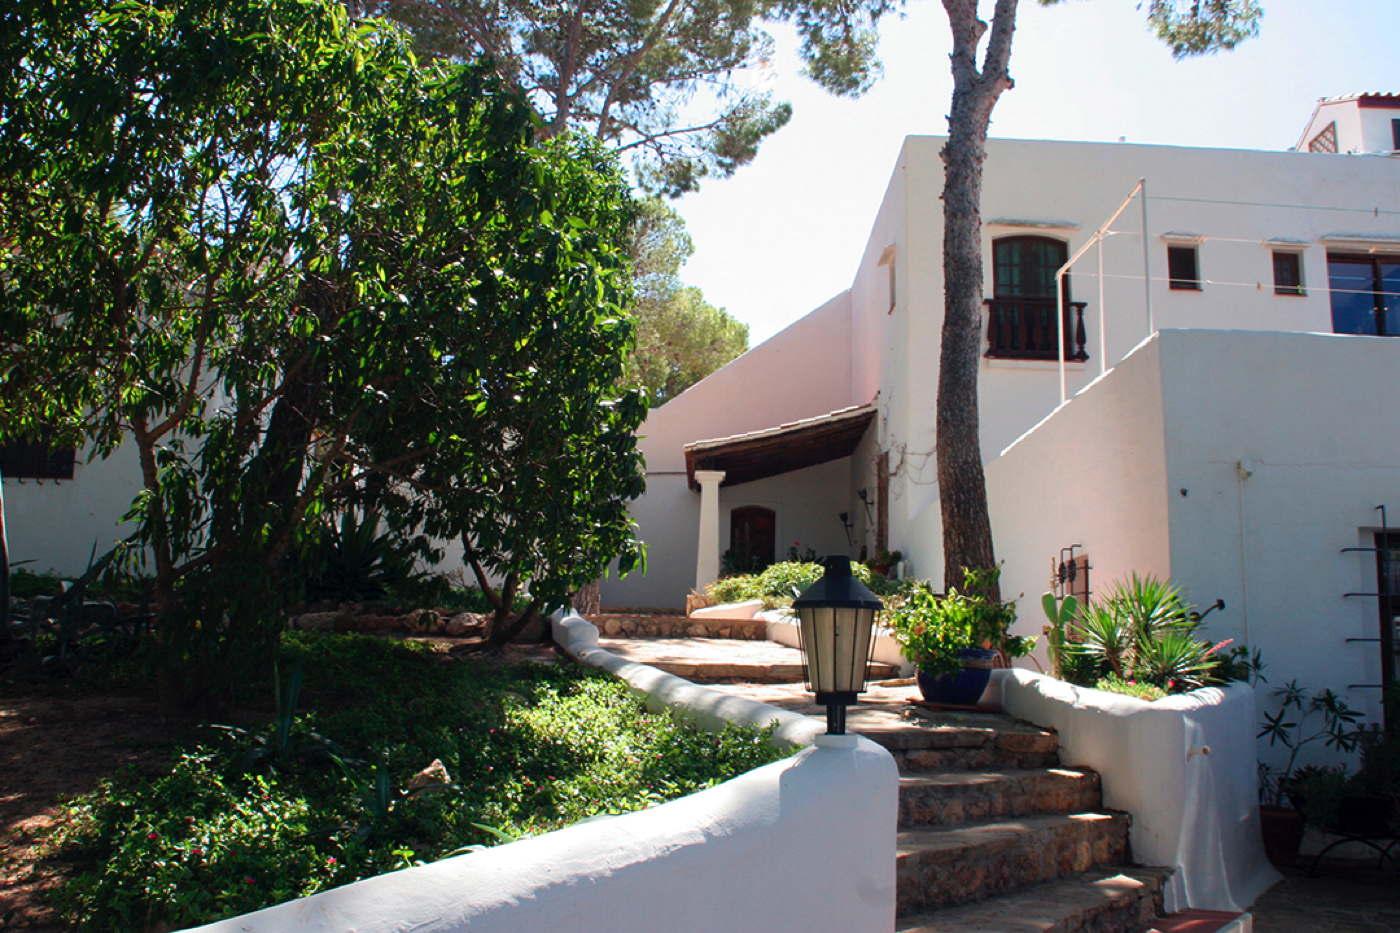 Holiday Villa Colina With Pool In Ibiza Domizile Reisen